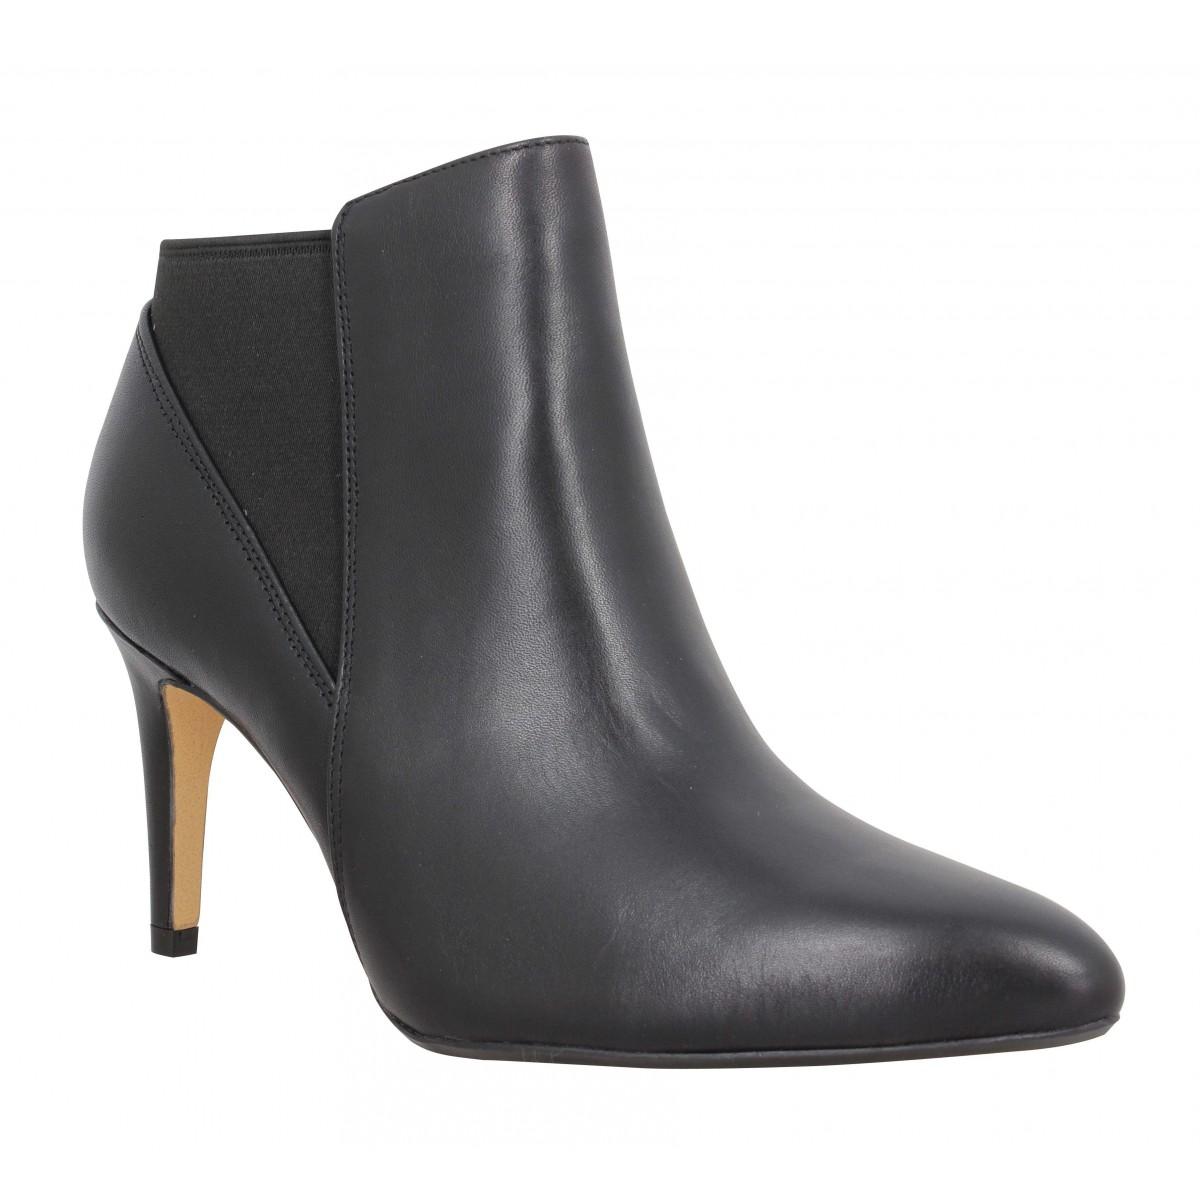 Bottines CLARKS Laina Violet cuir Femme Noir